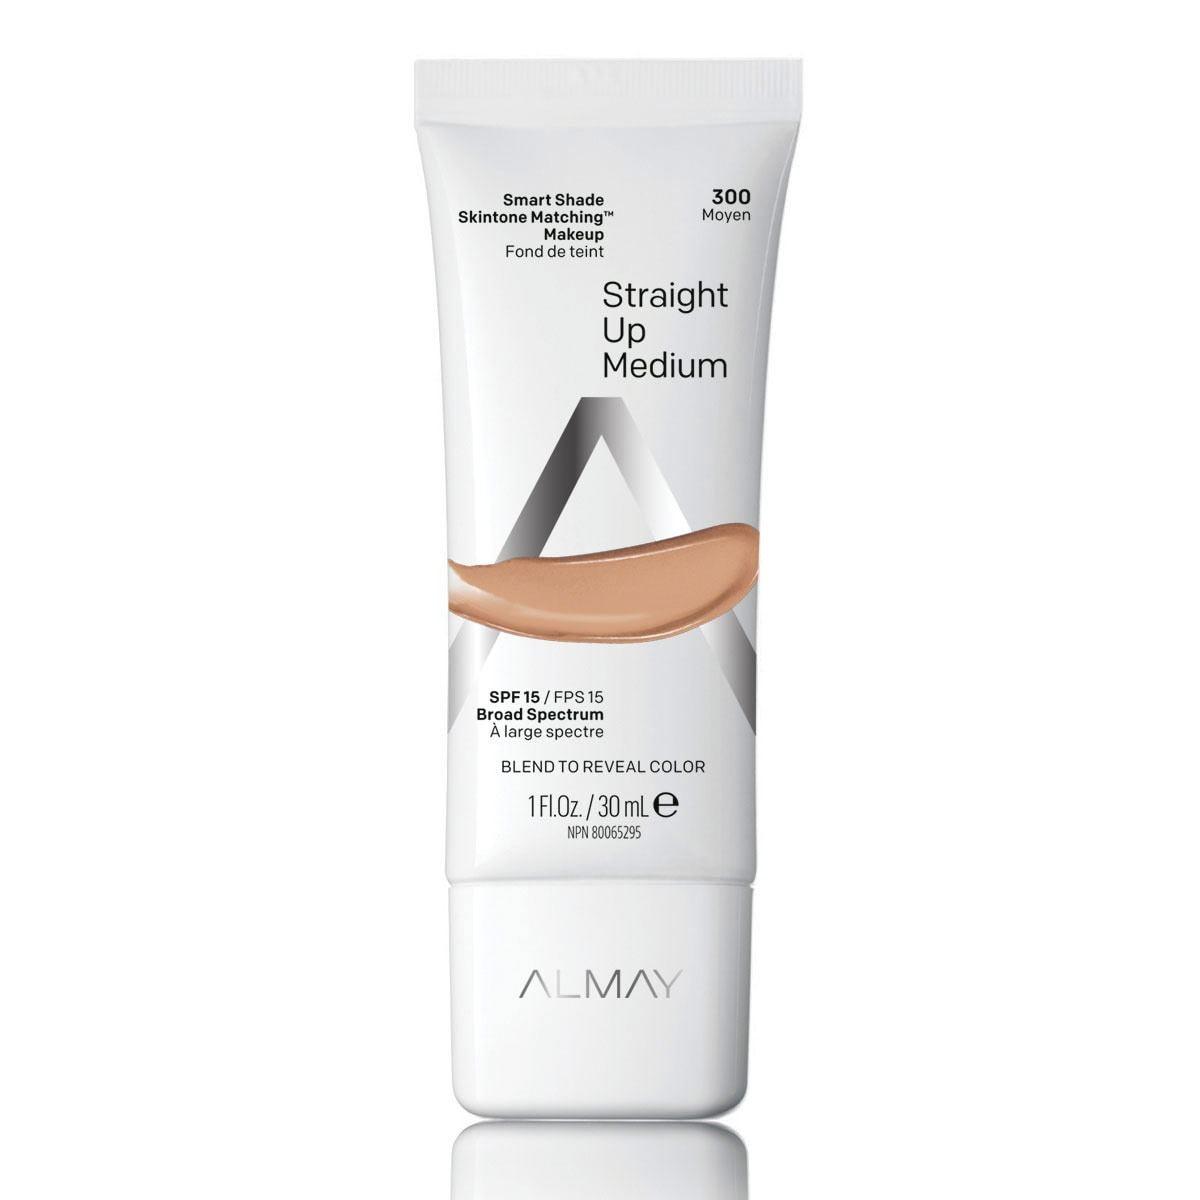 Smart Shade Skintone Matching Makeup Medium